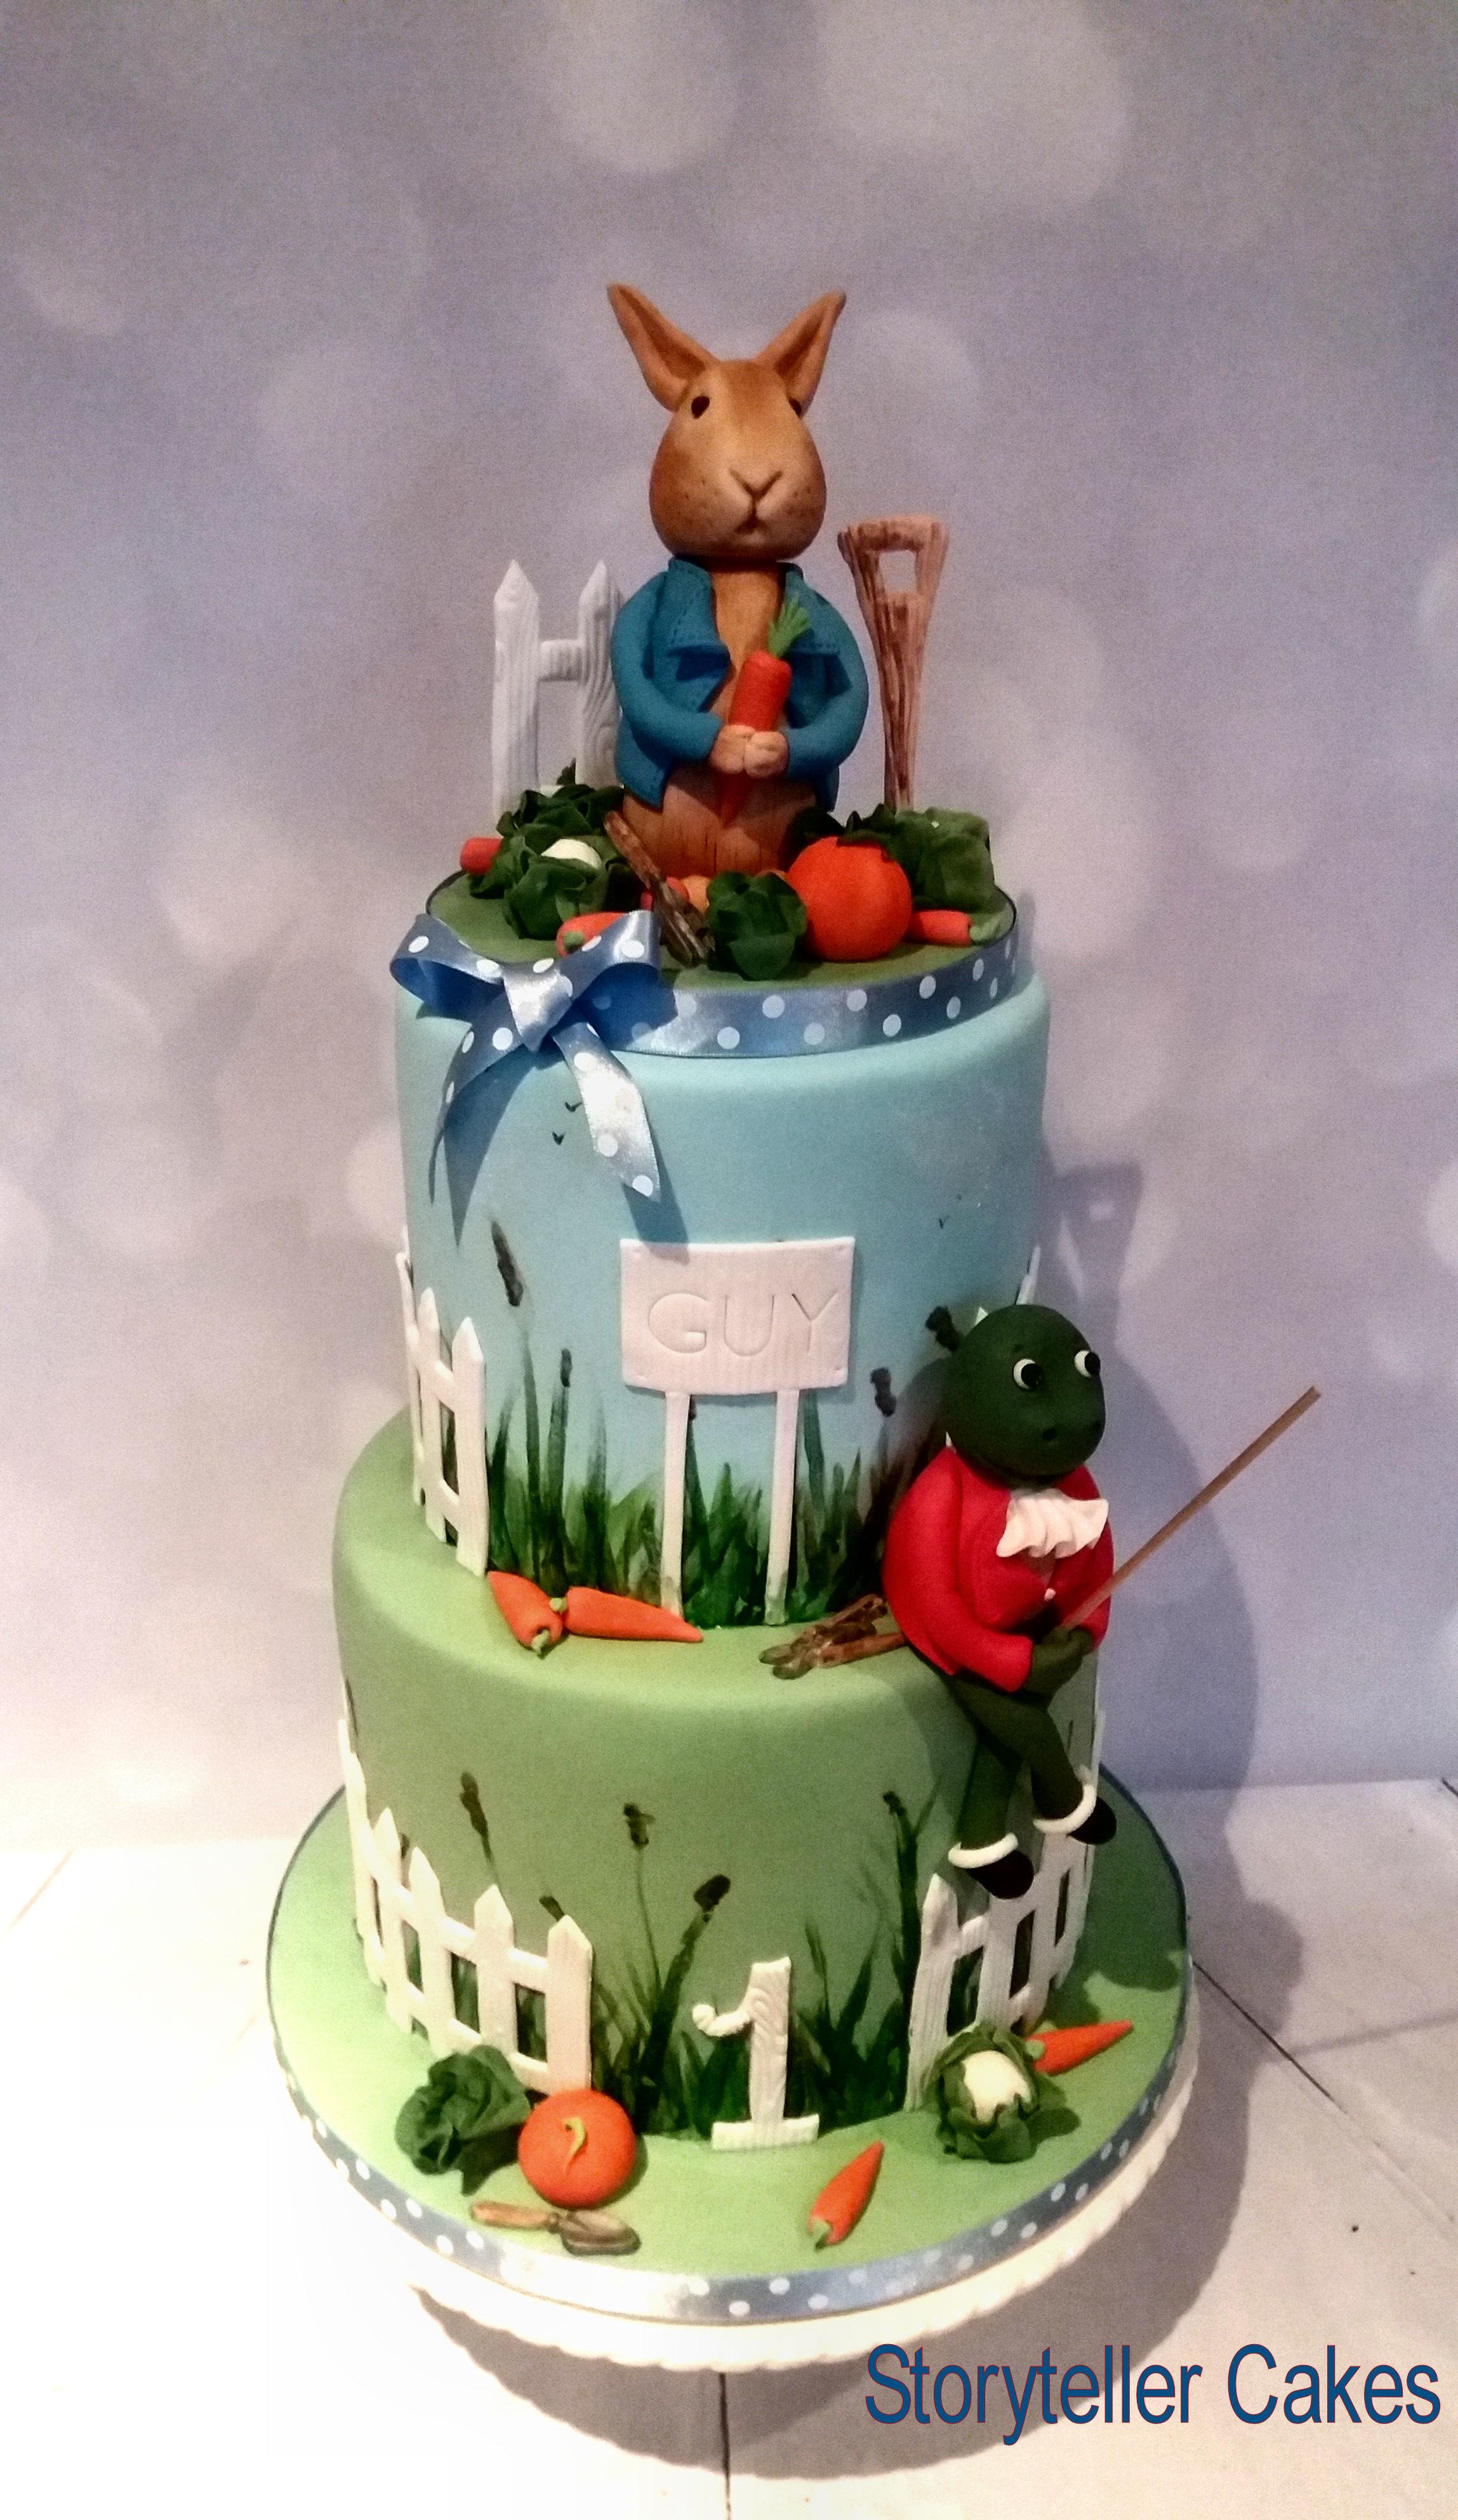 peter rabbit cake 1.jpg